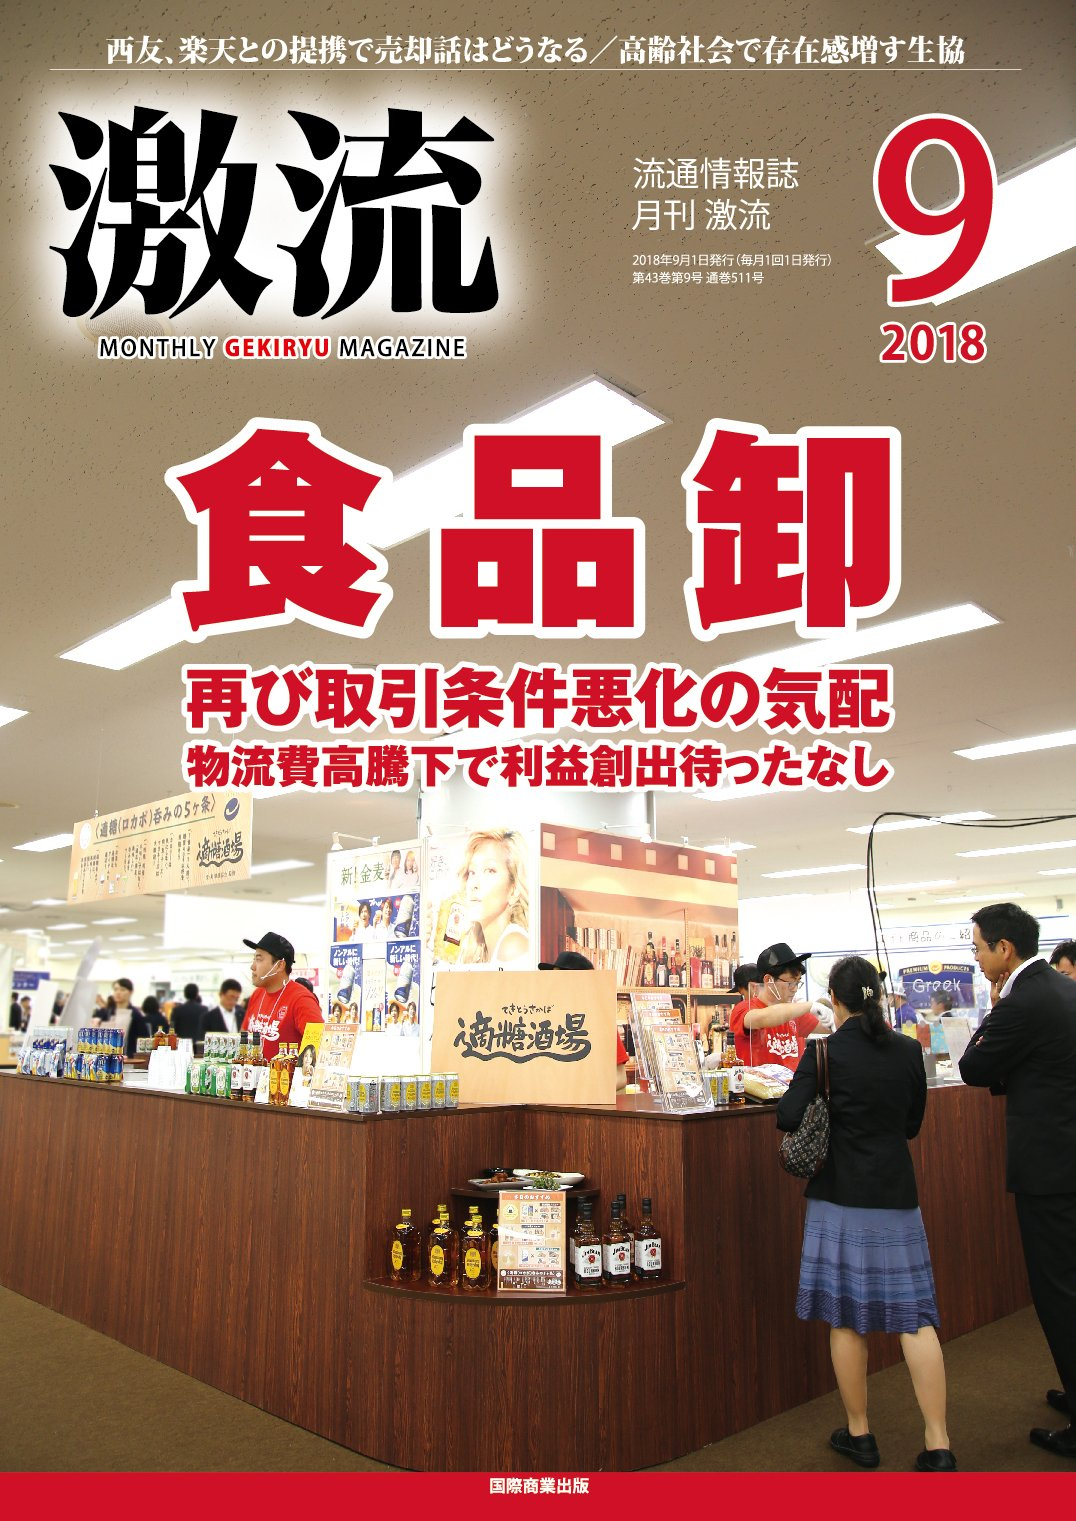 JAPANESE MAGAZINE Monthly torrent 2018 September issue [food